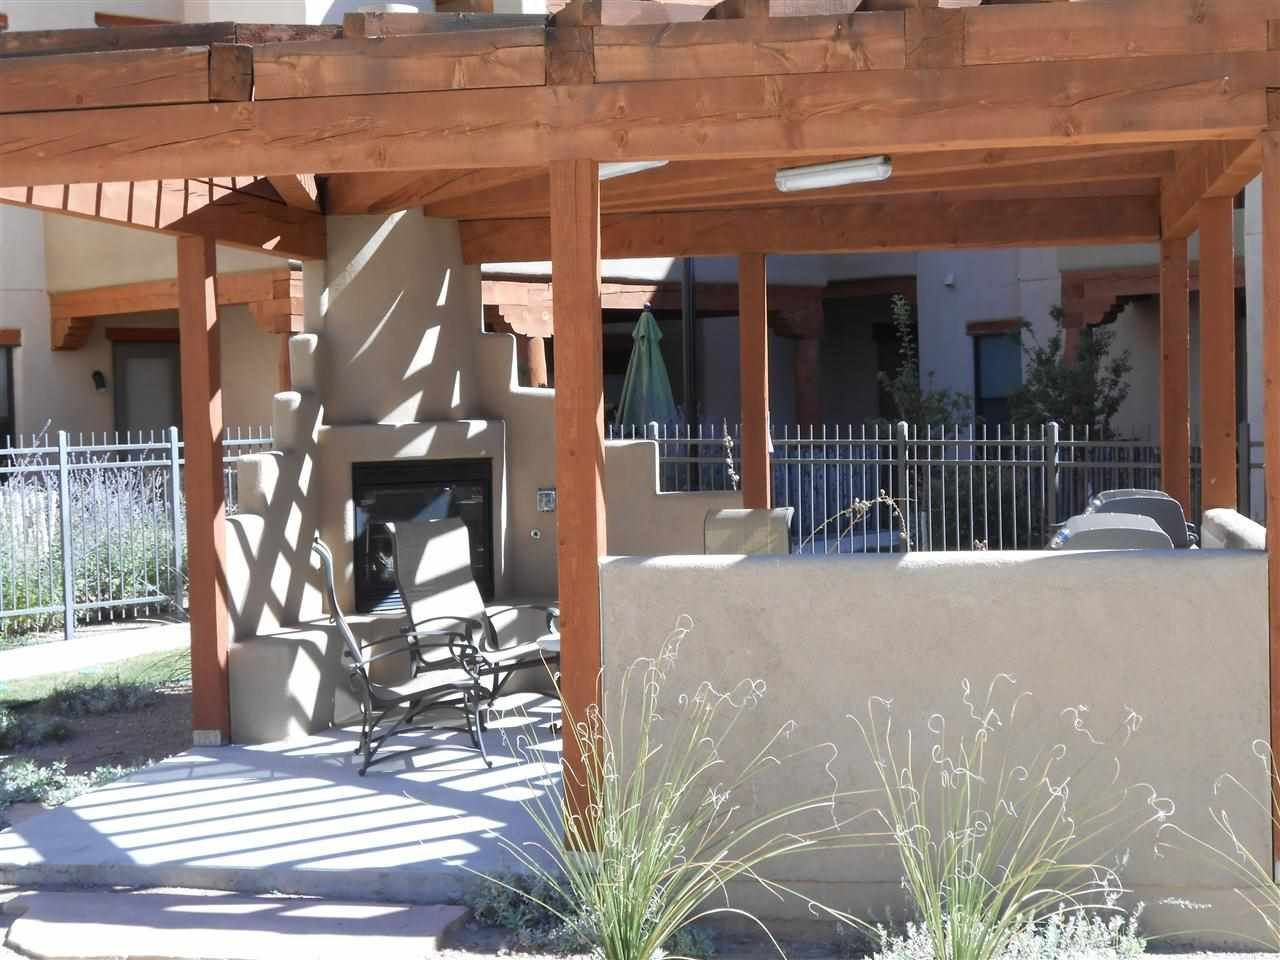 Kiva Fireplace Insert Google Search Adobe House Fireplace Inserts Outdoor